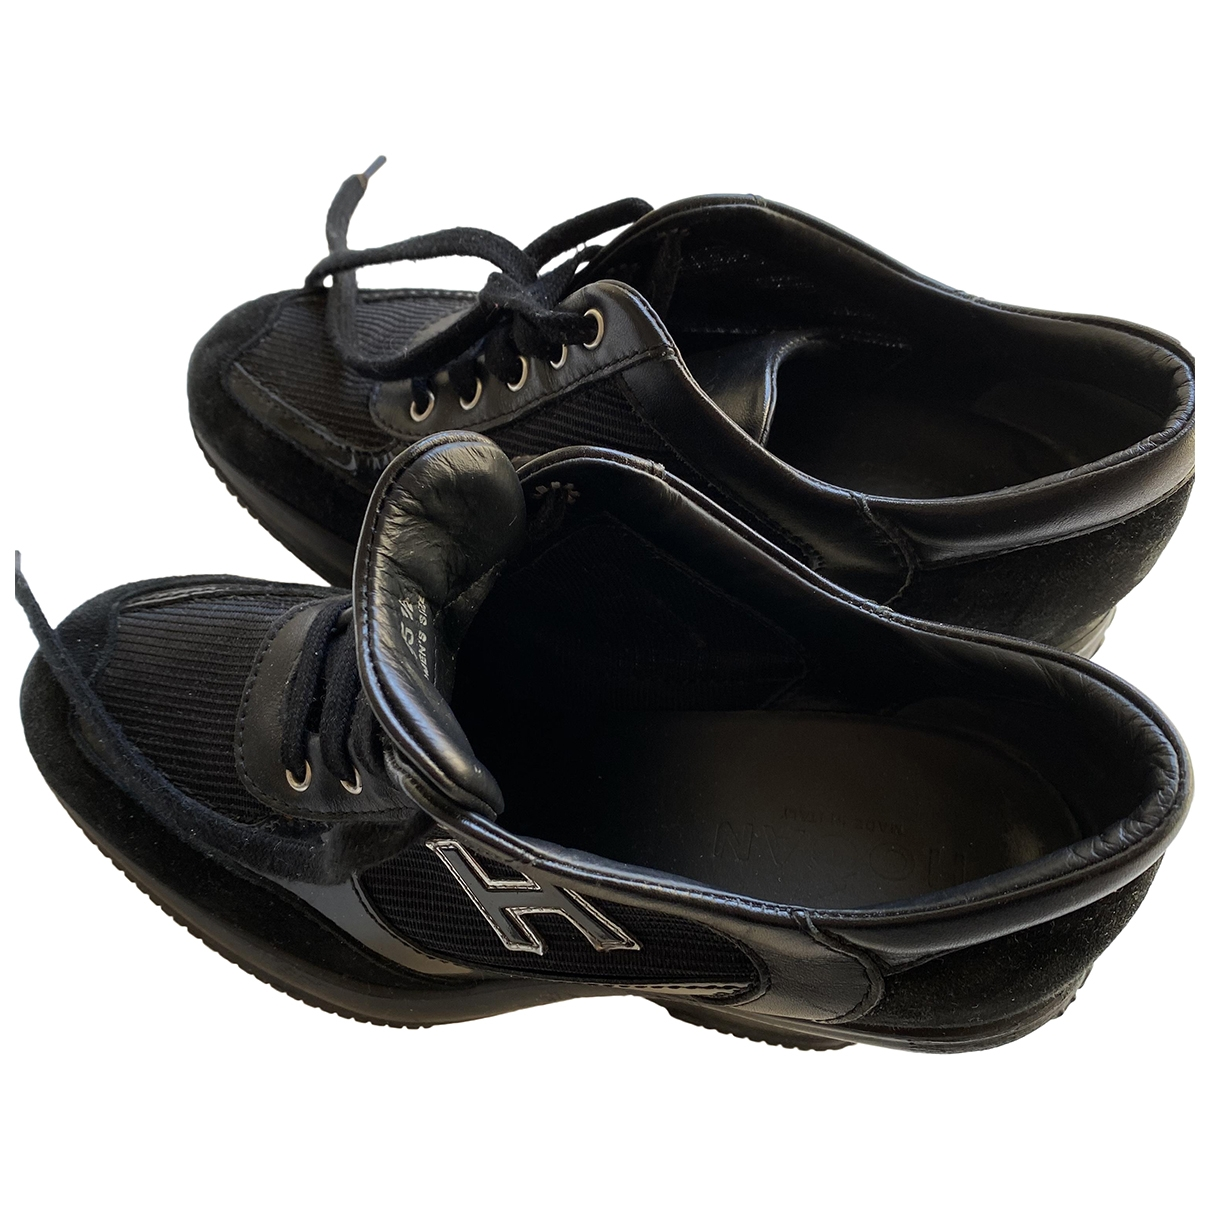 Hogan \N Black Leather Trainers for Women 35.5 EU